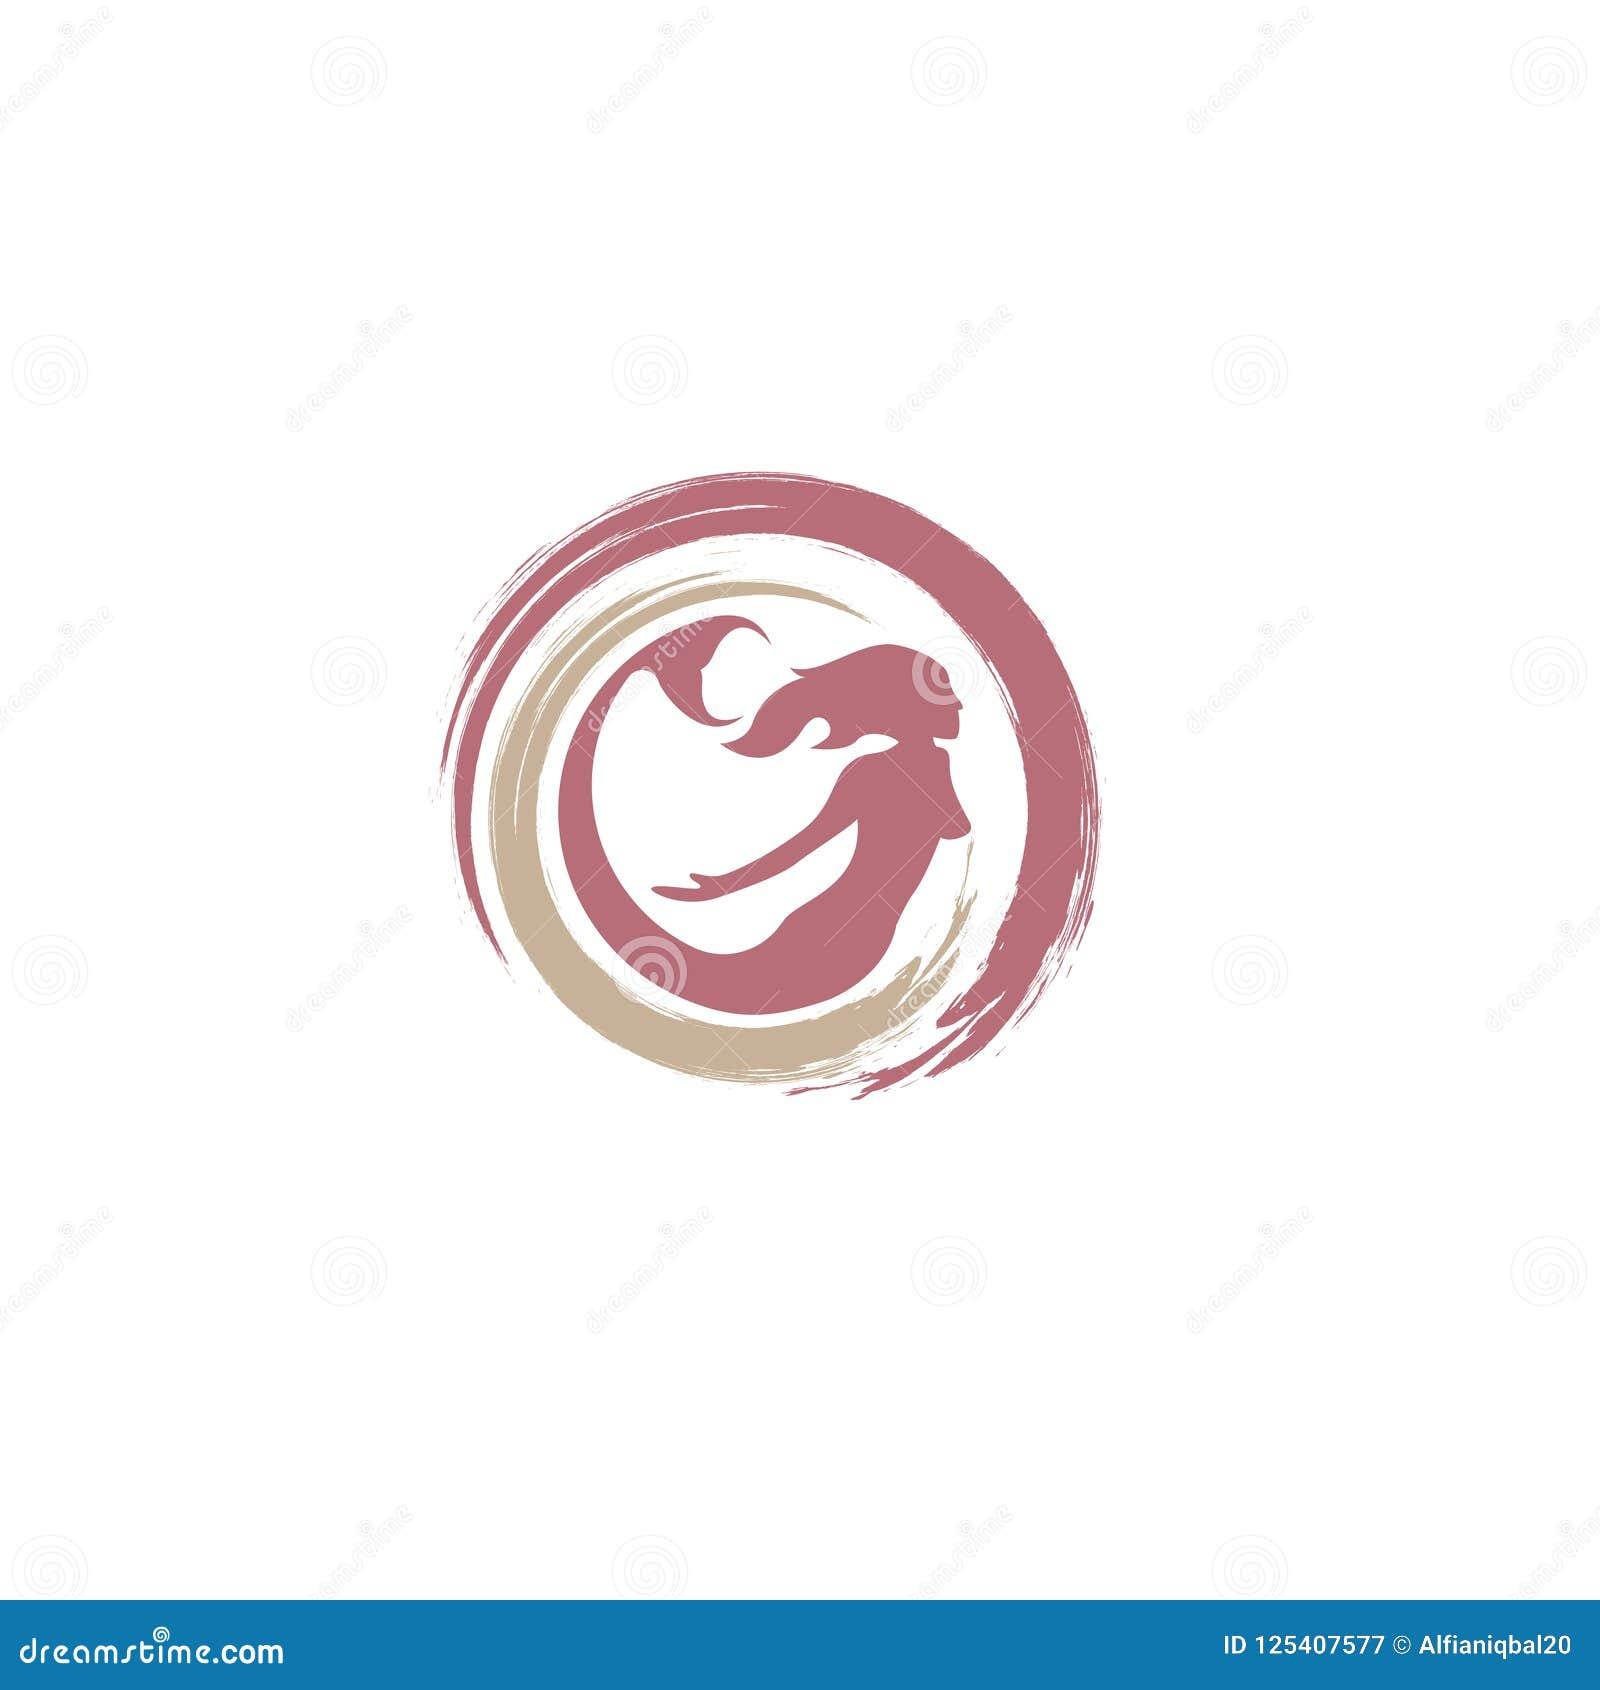 Mermaid logo icon design, vector illustration. mermaid vector silhouette illustration. Mermaid tail logo vector.